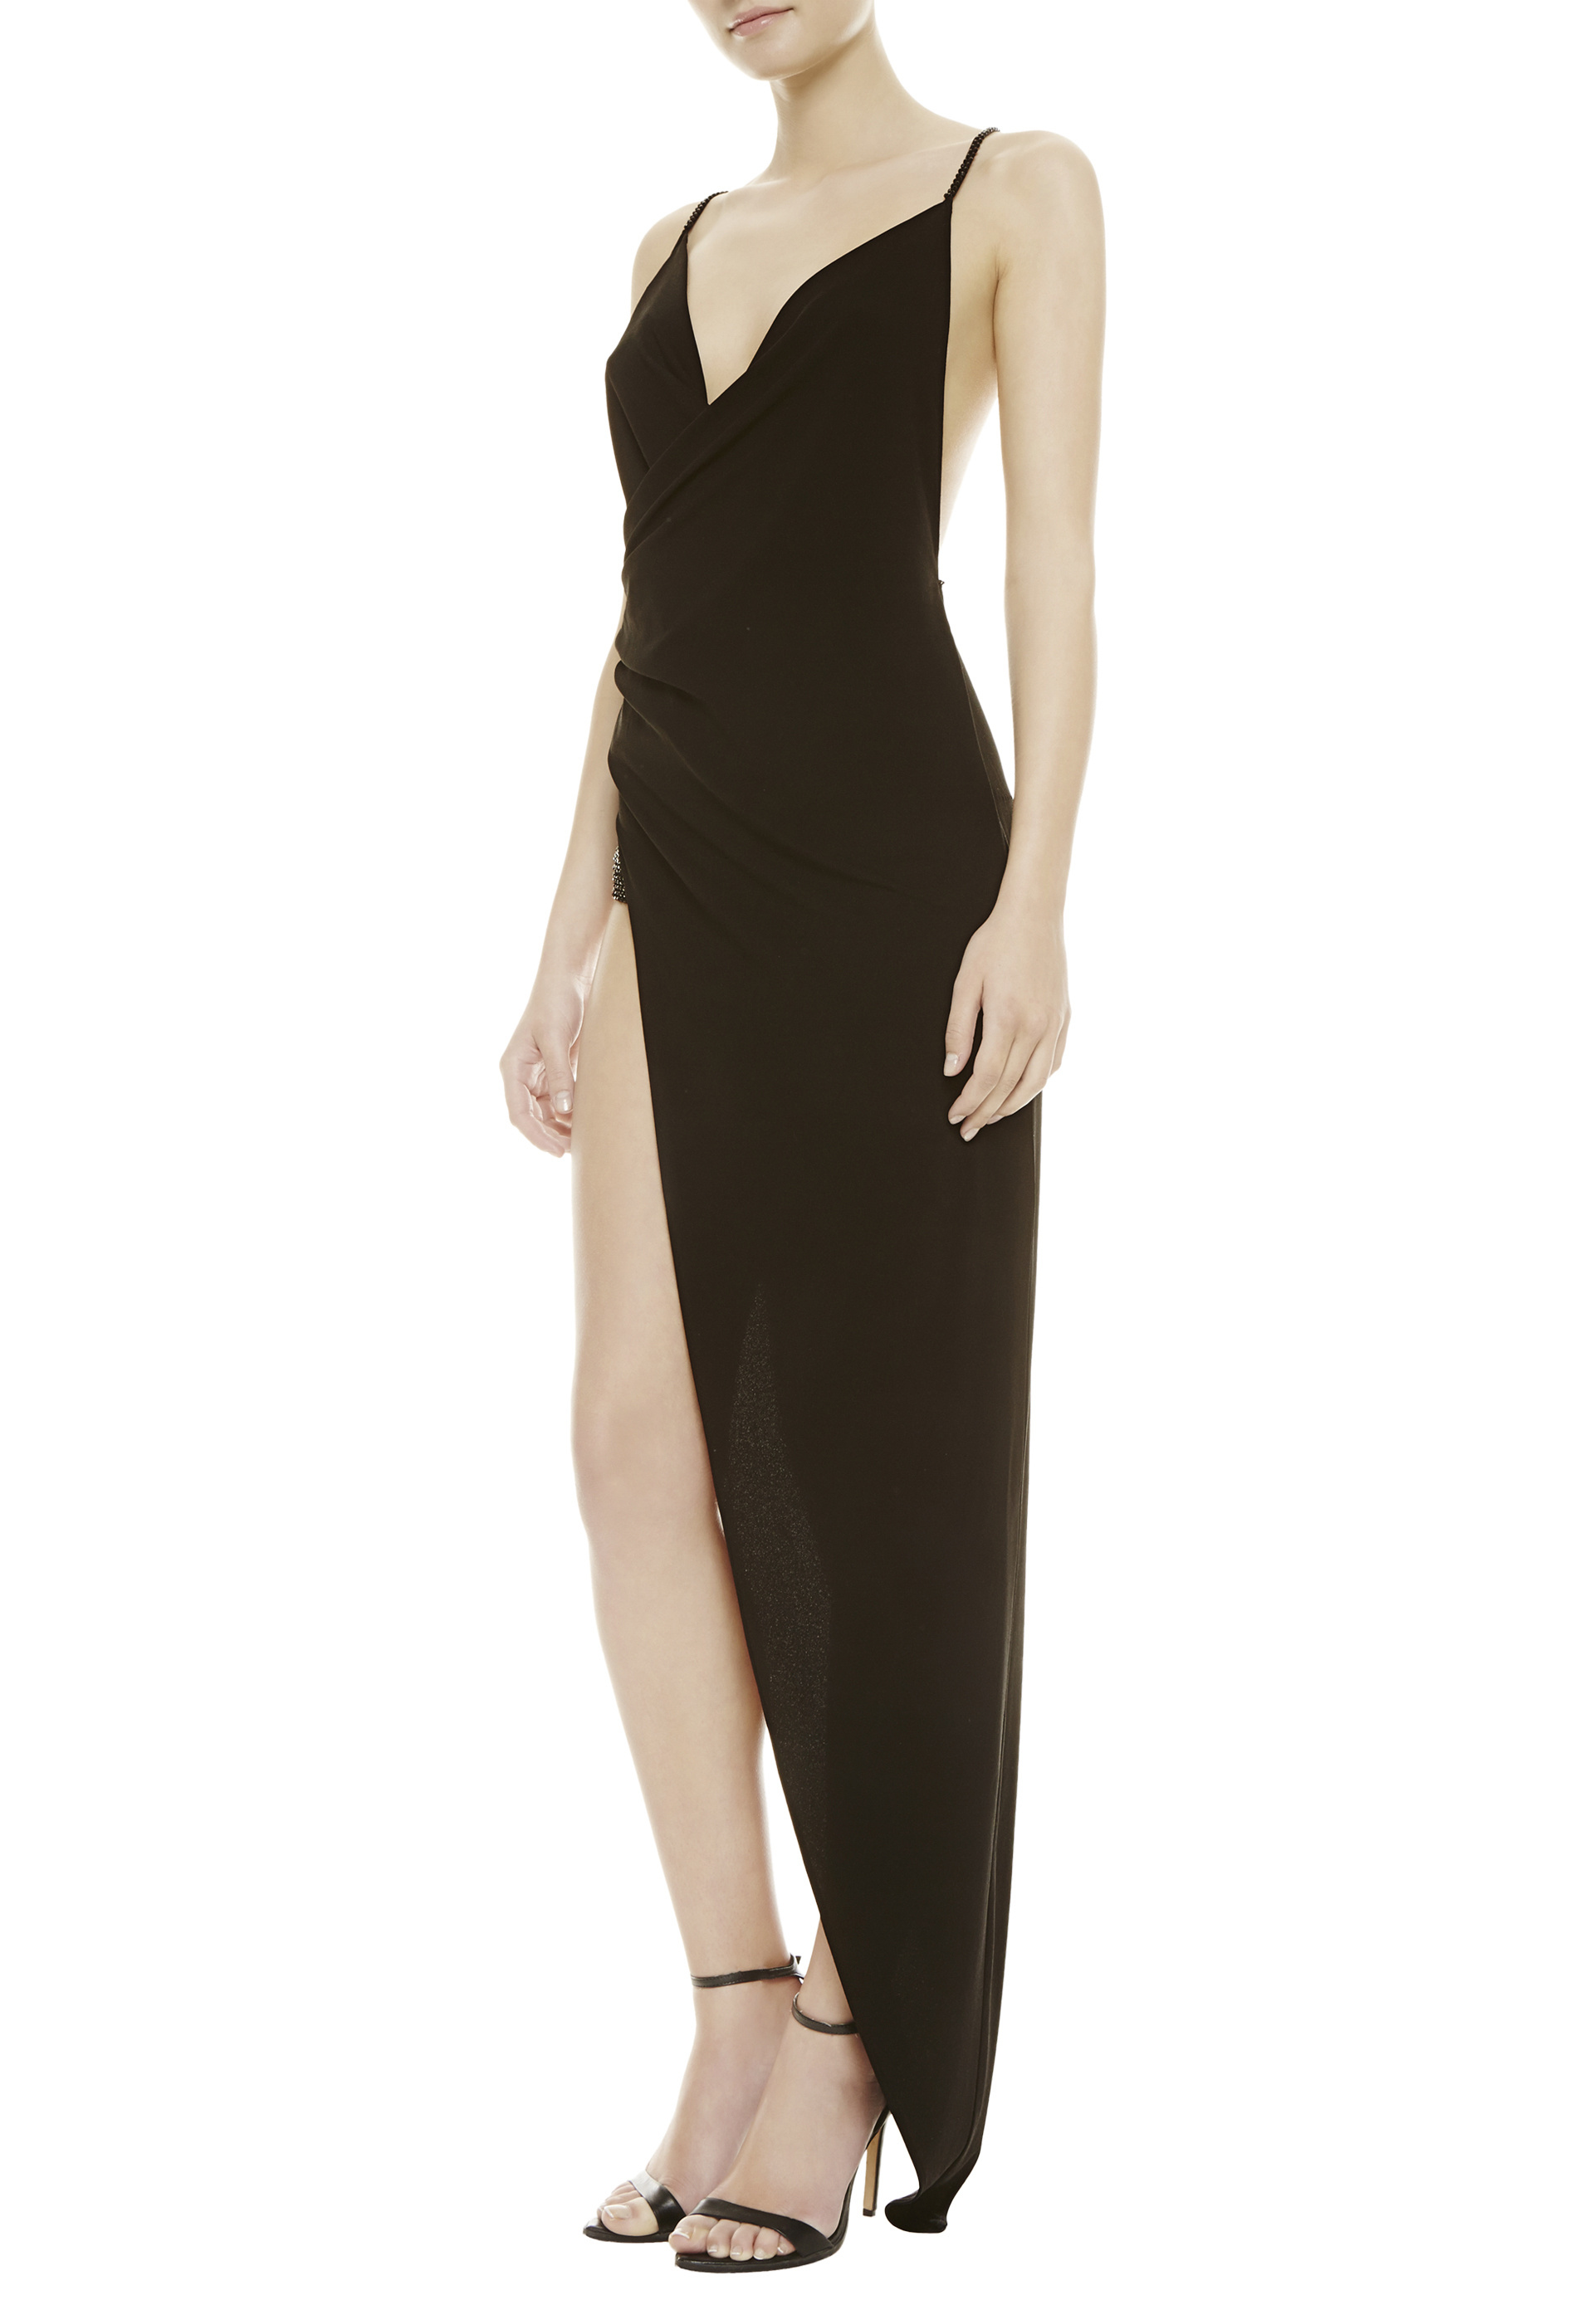 Dress: http://www.laperla.com/us/uscfilpd0019219.html